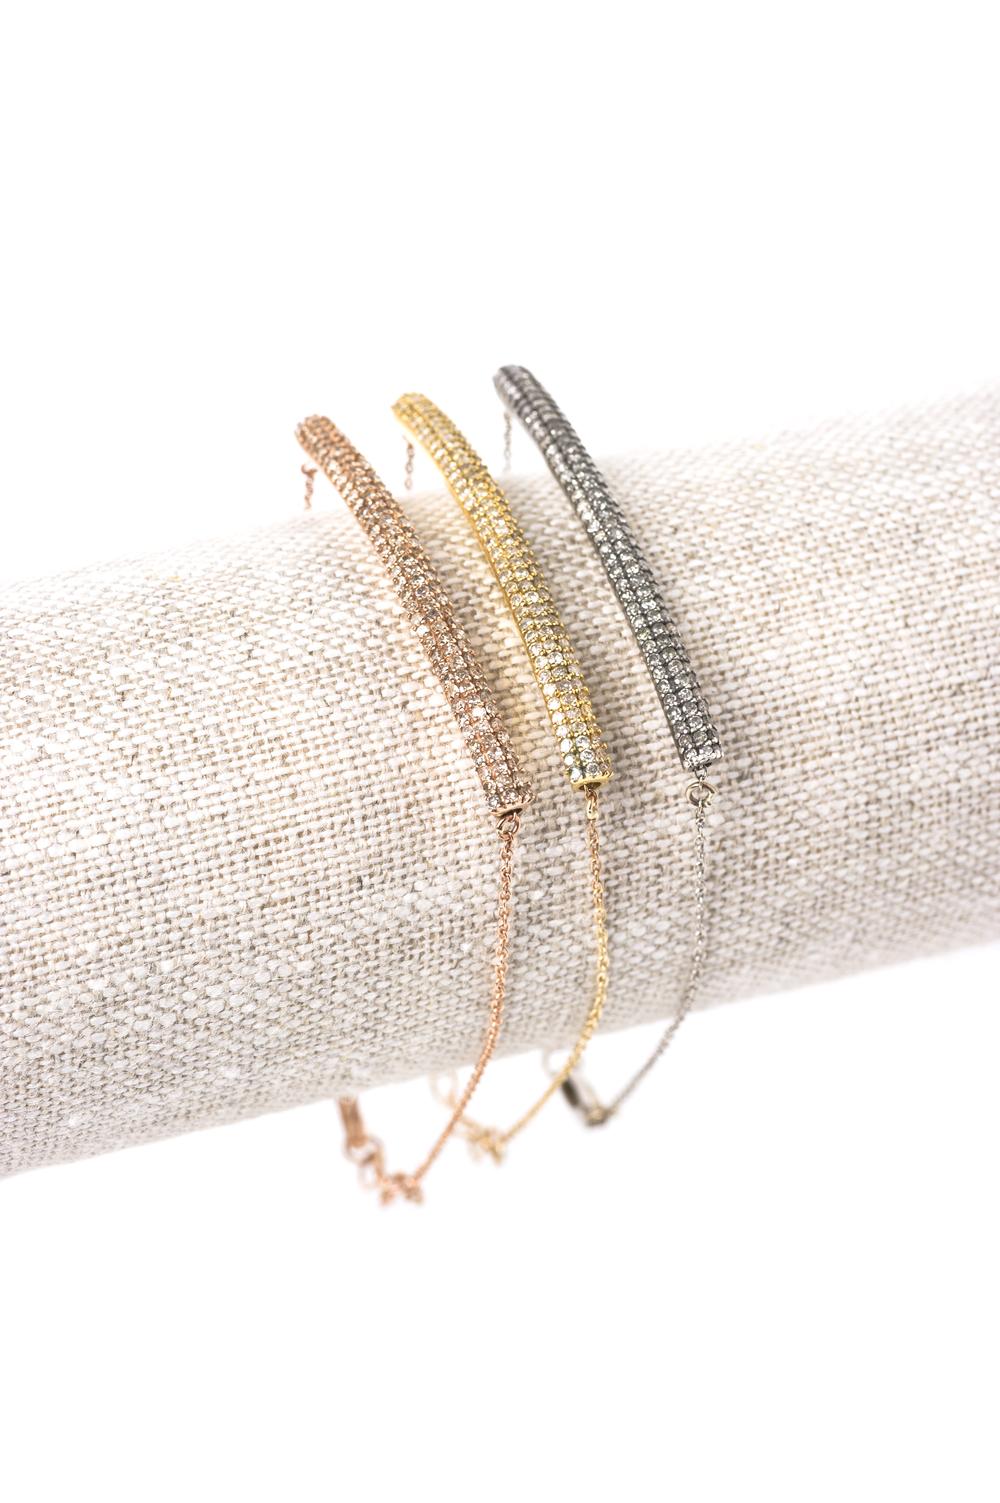 128 three curved bar bracelets.jpg